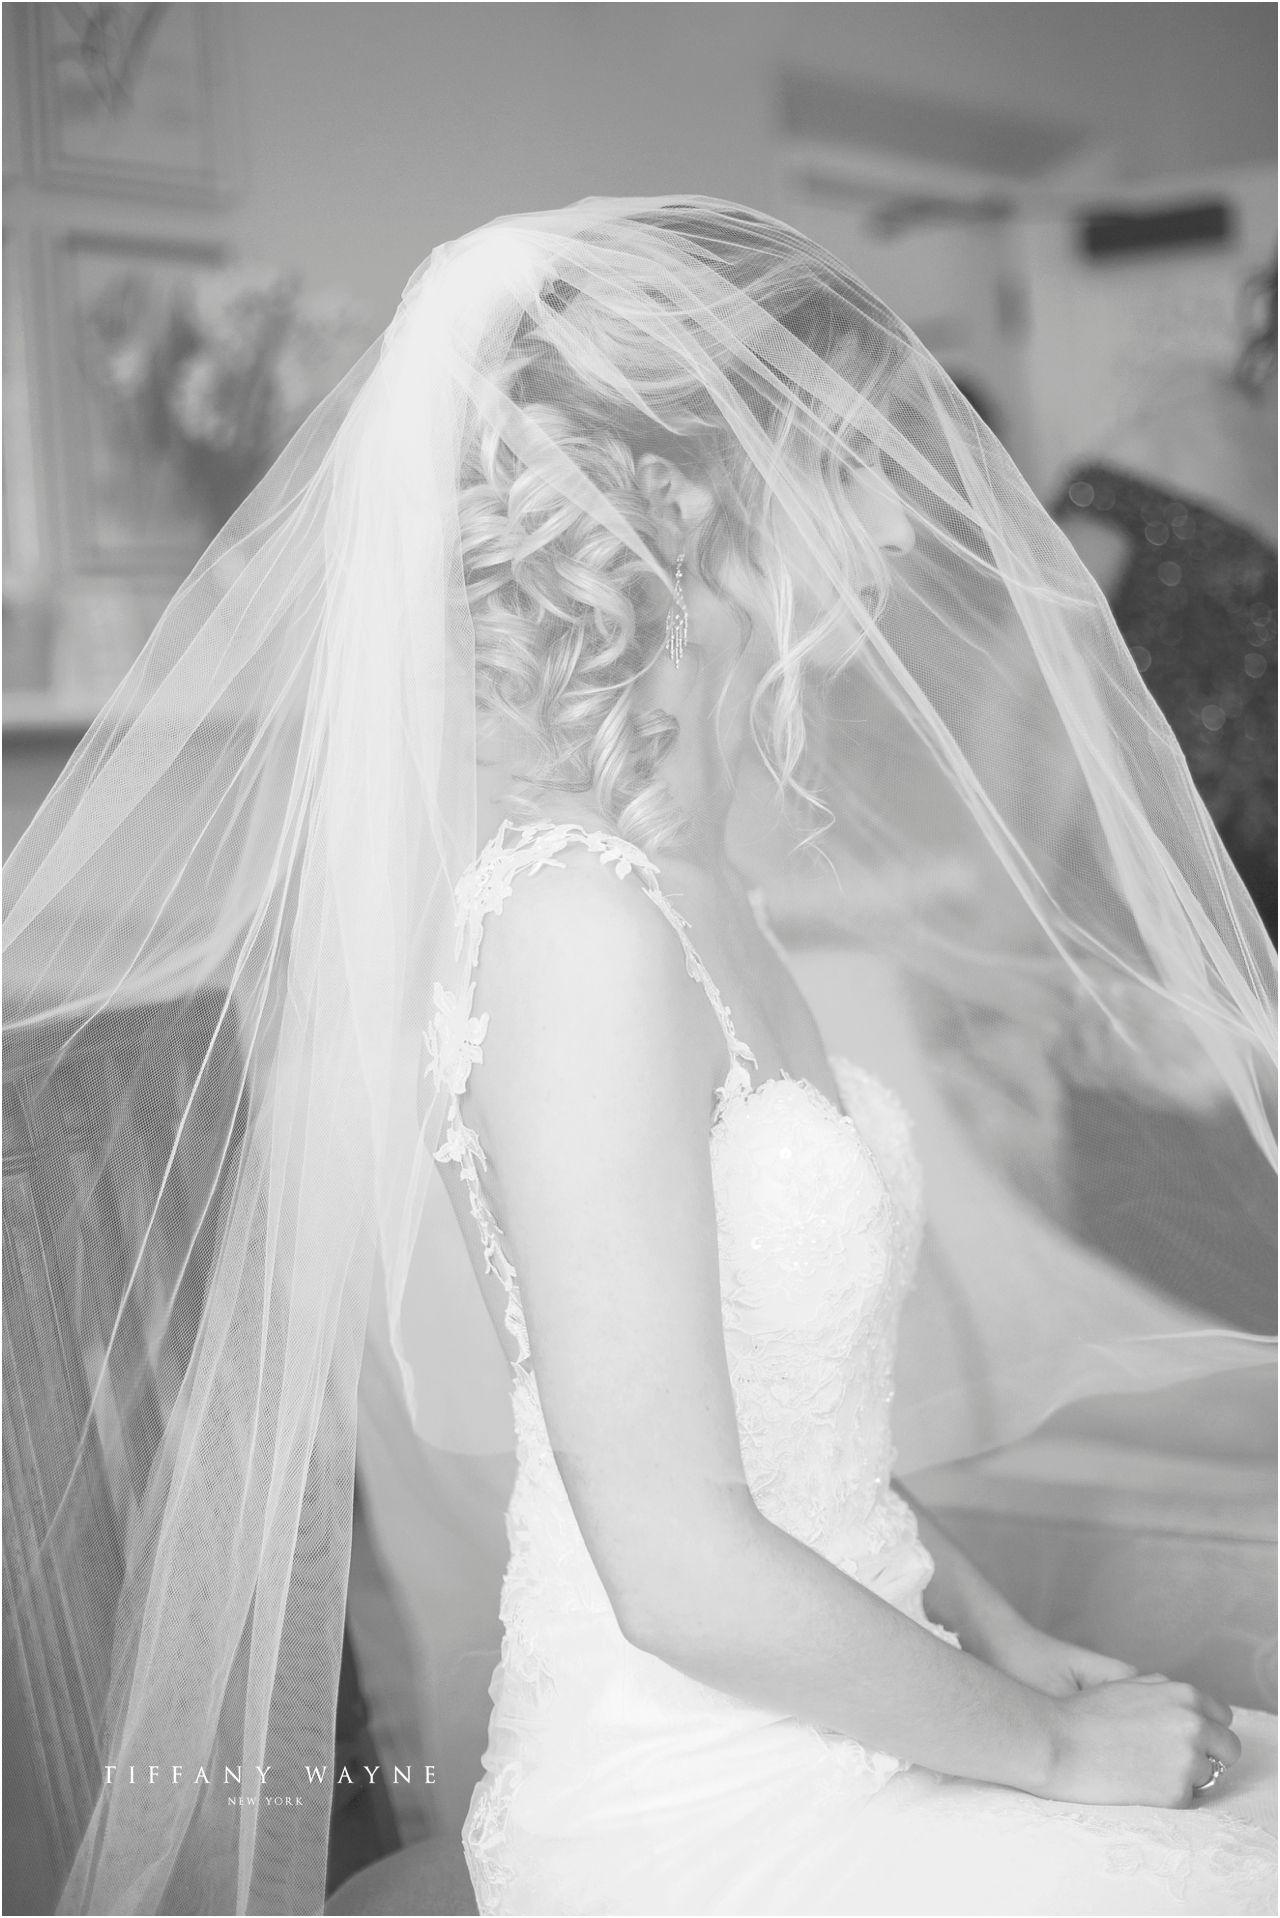 Wedding veil photography wedding veil bridal portraits wedding